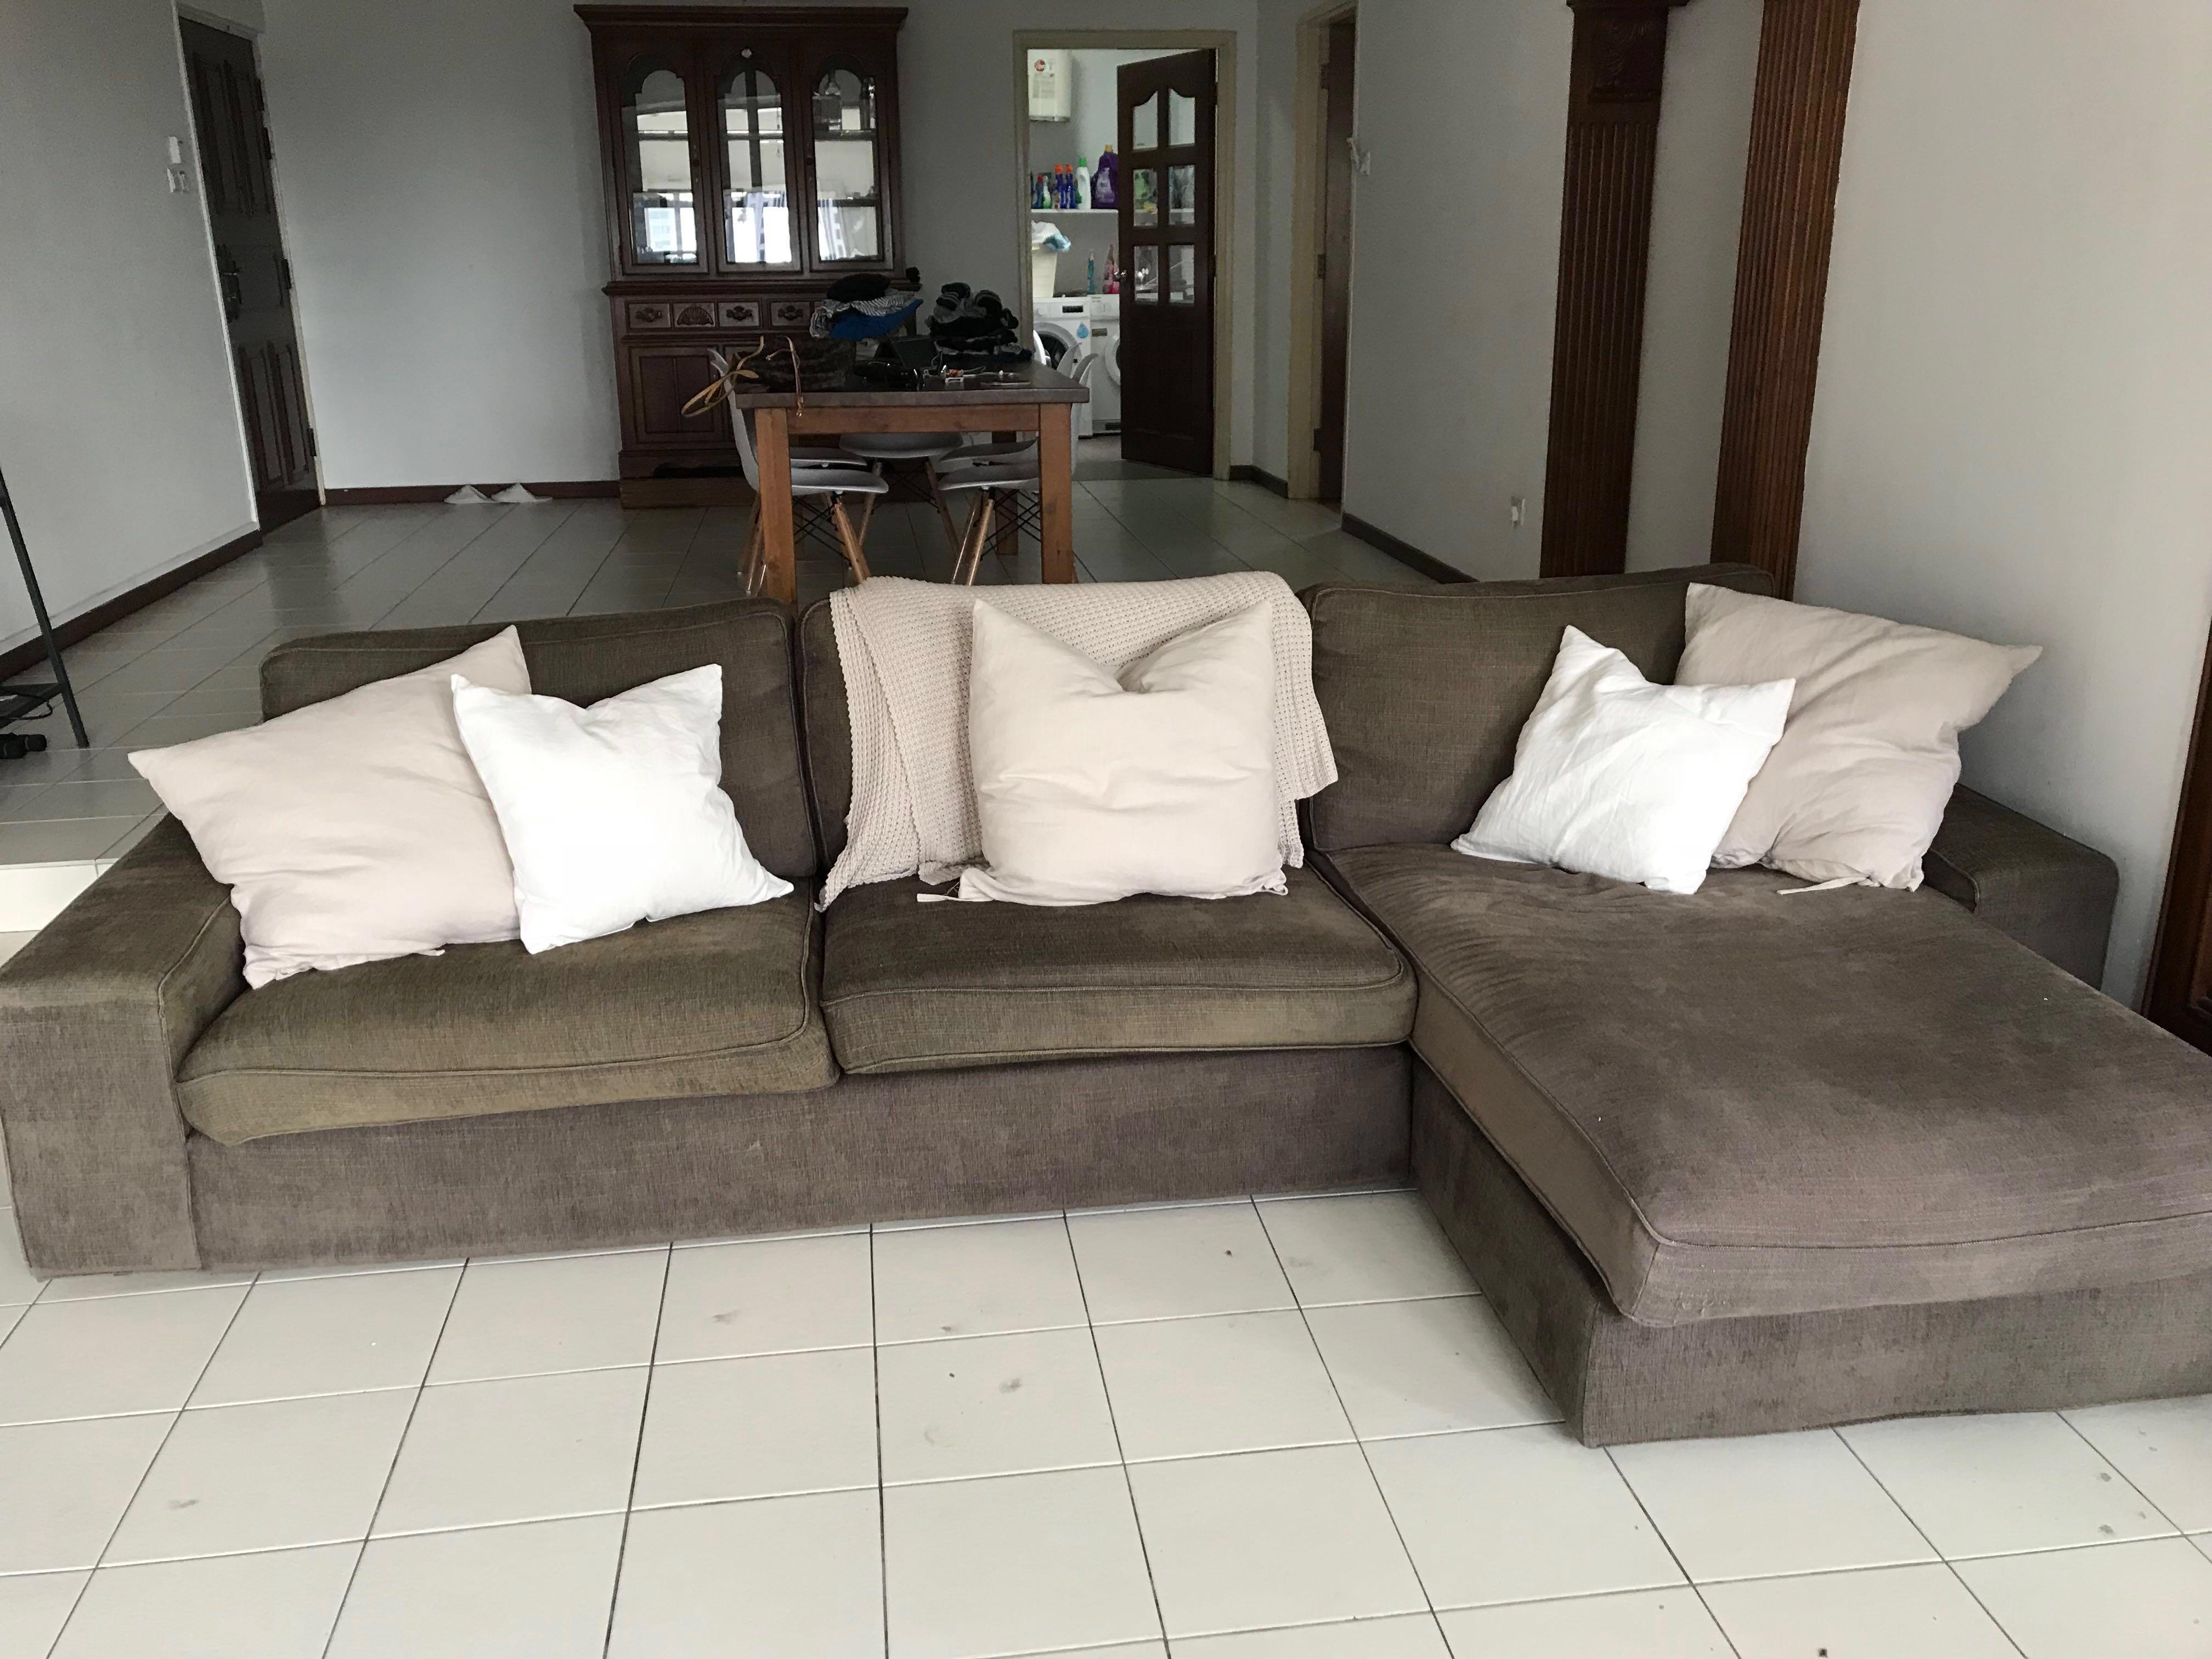 Tremendous Free Large Comfy Sofa Furniture Sofas On Carousell Spiritservingveterans Wood Chair Design Ideas Spiritservingveteransorg